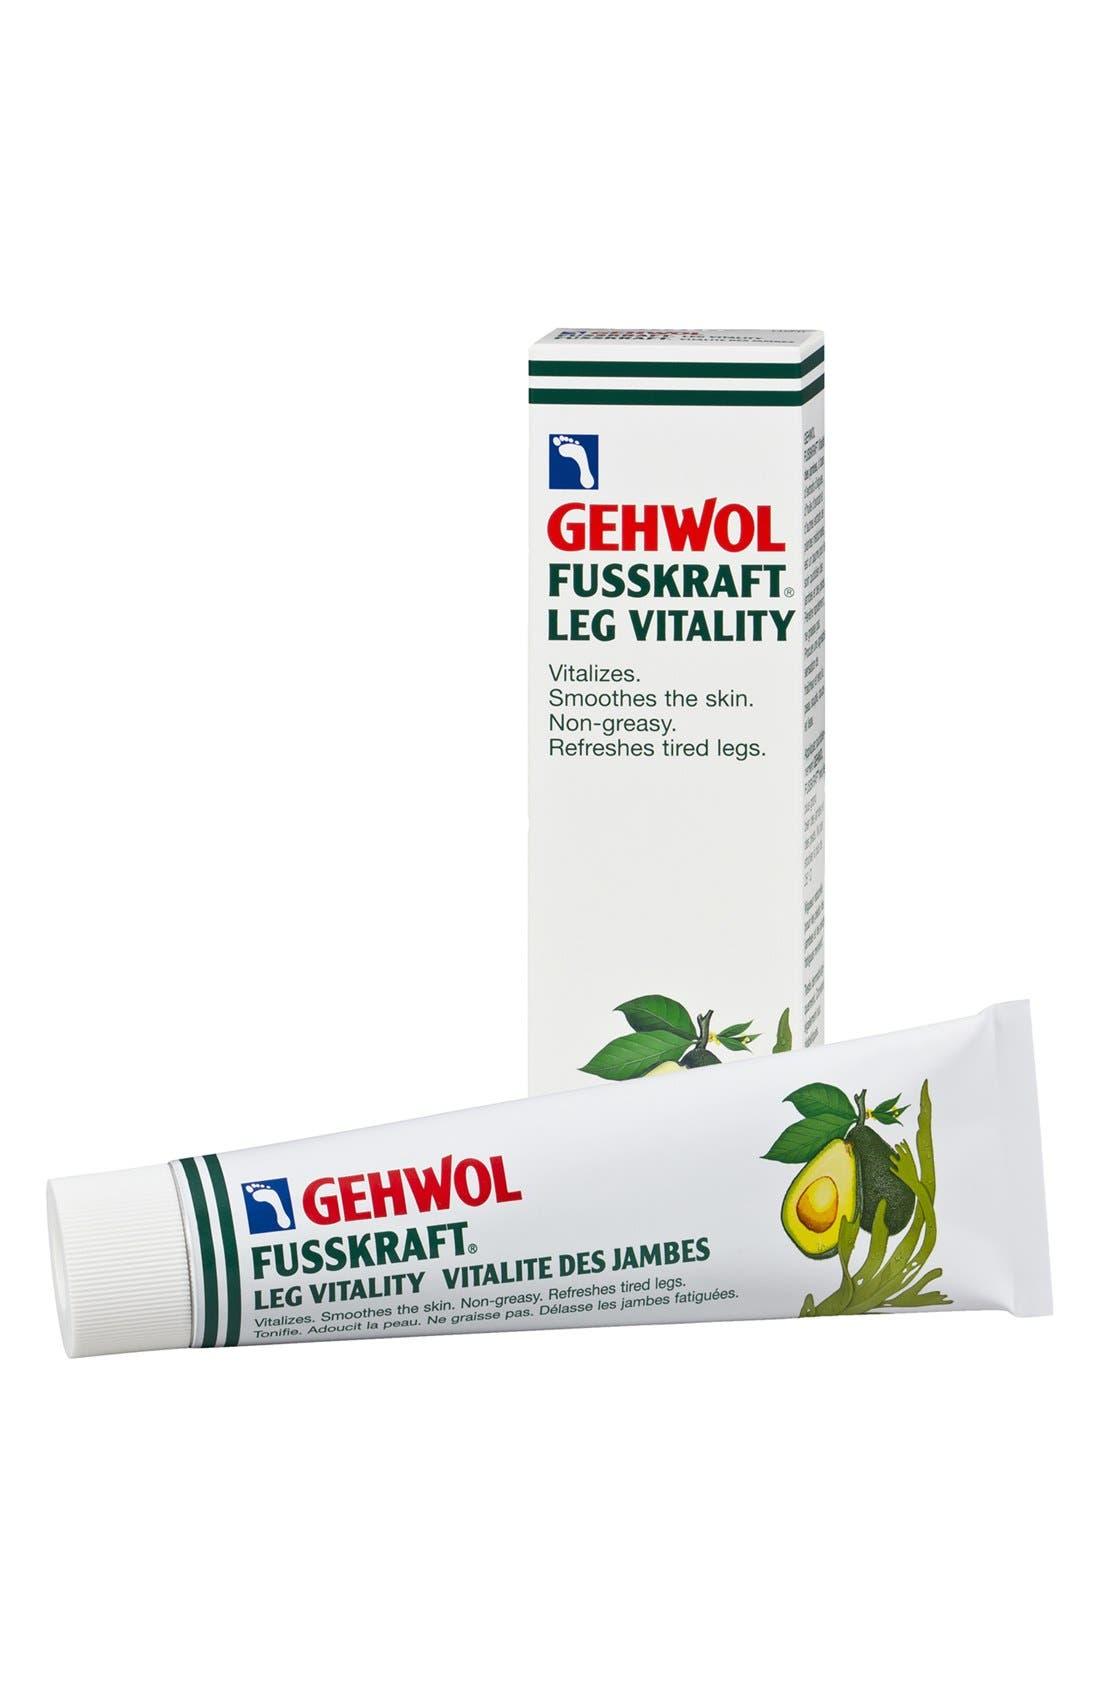 GEHWOL® FUSSKRAFT® Leg Vitality Balm